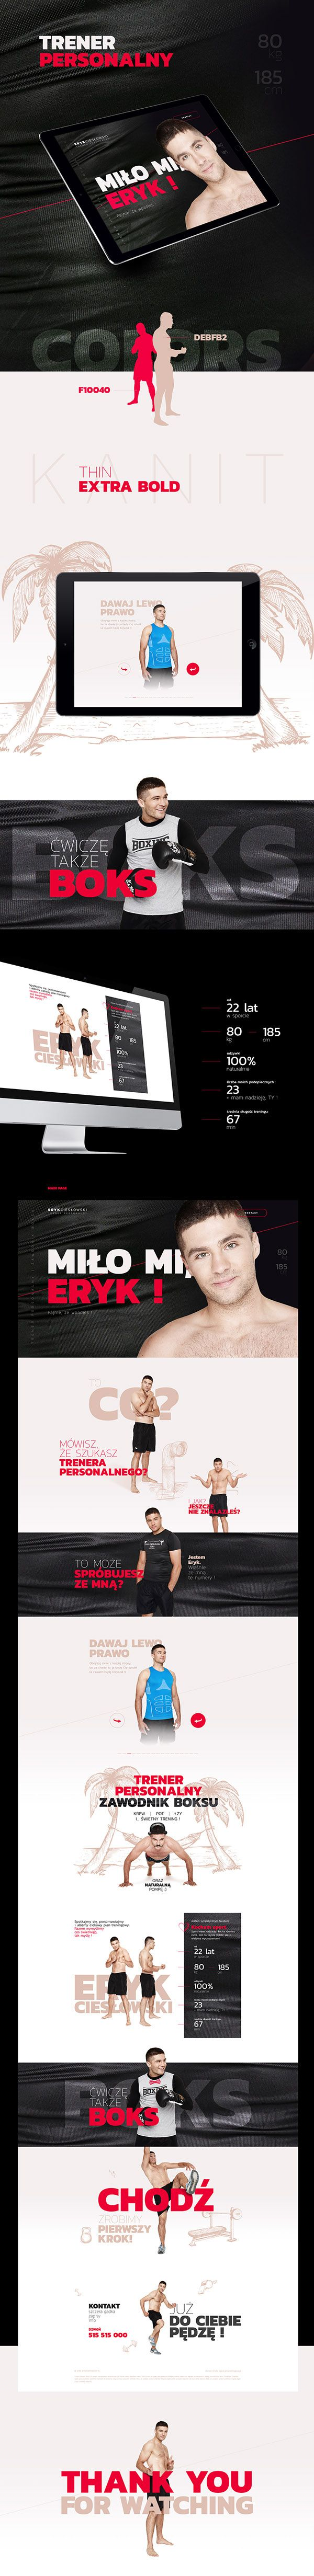 Web design. Modern website. Personal Trainer Website.